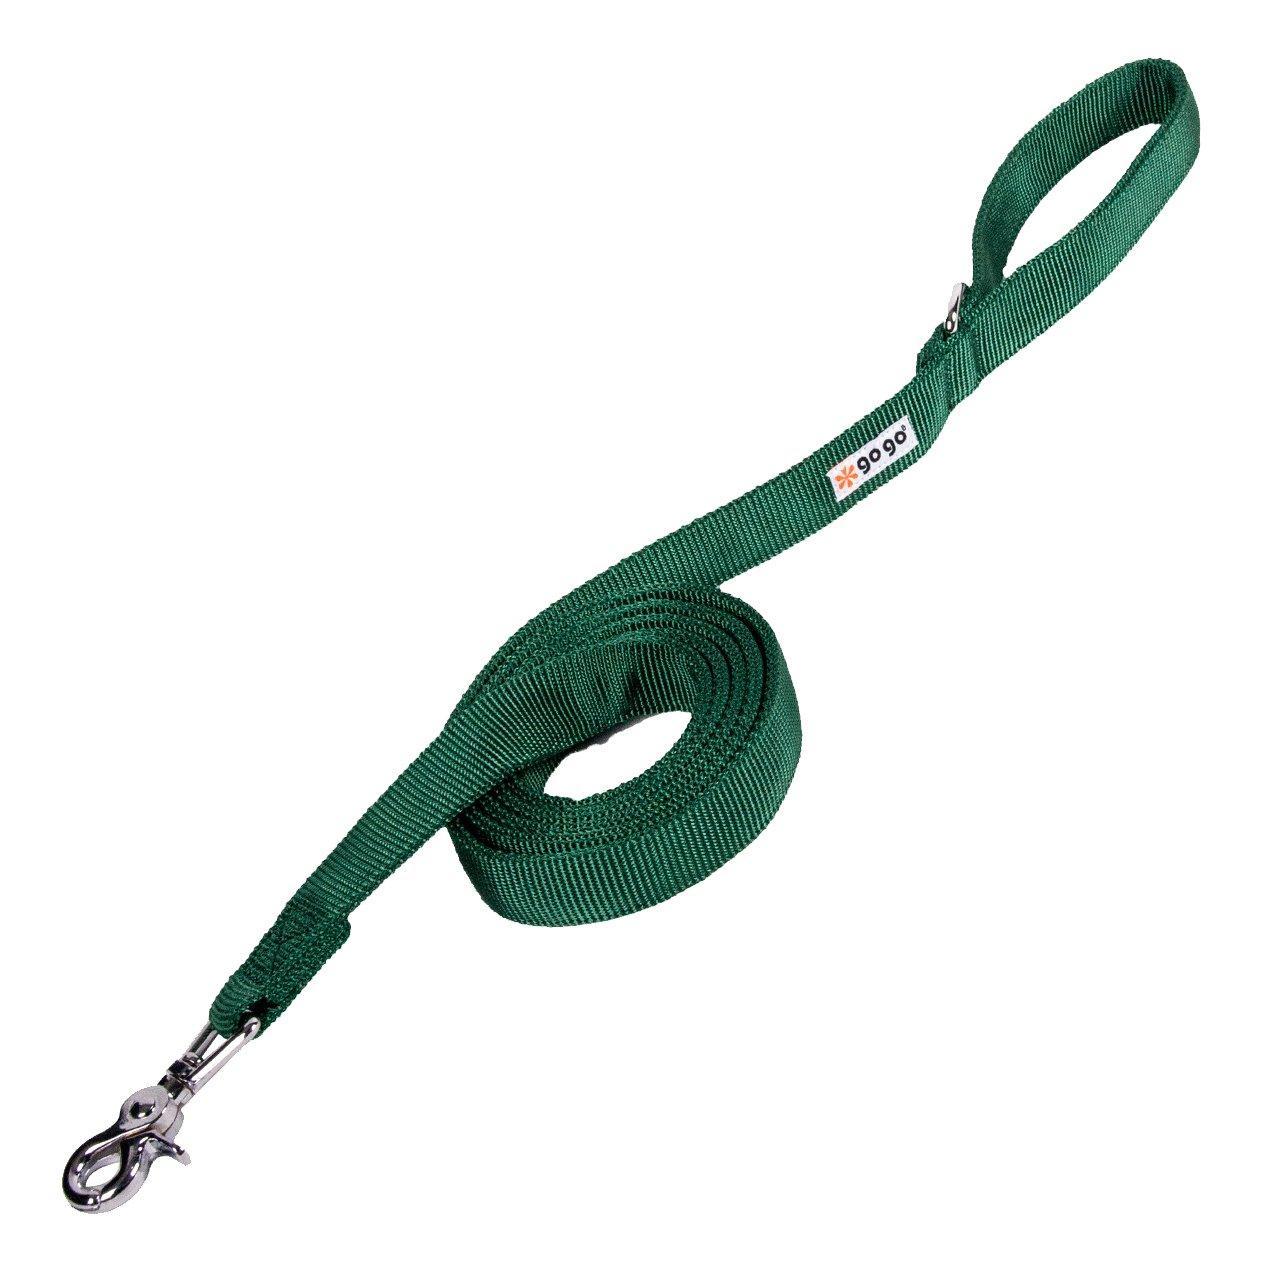 GoGo Pet Products 1-Inch Wide Comfy Nylon Dog Leash, 6-Feet Long, Hunter Green